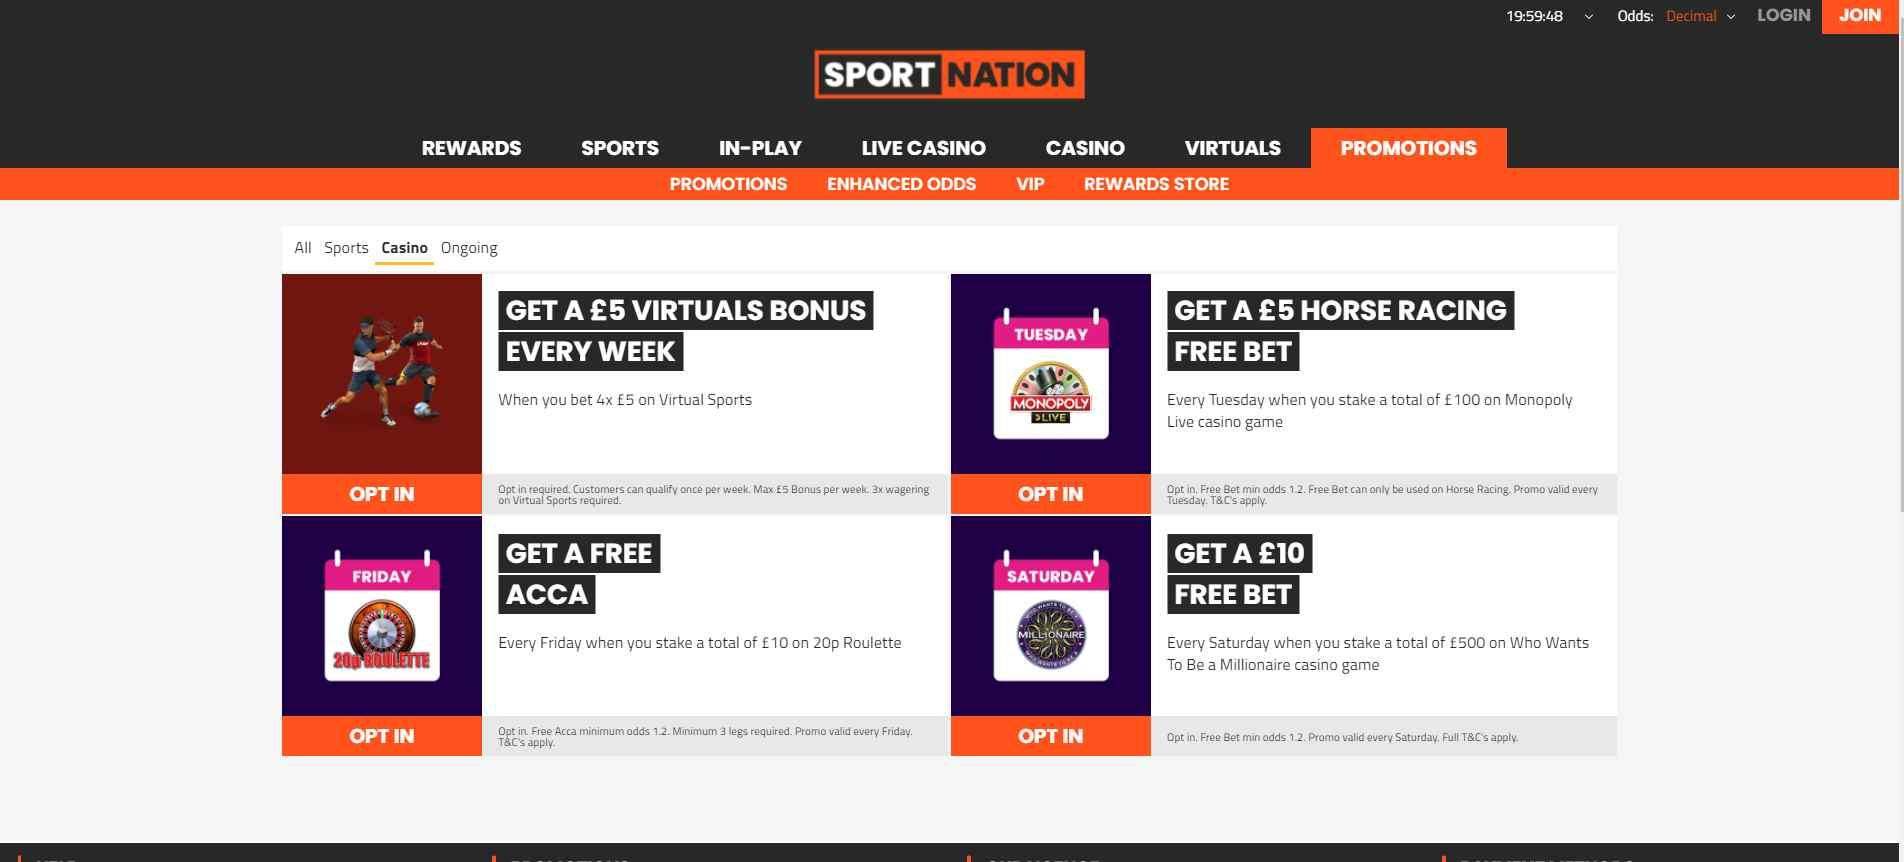 SportNation Promotions